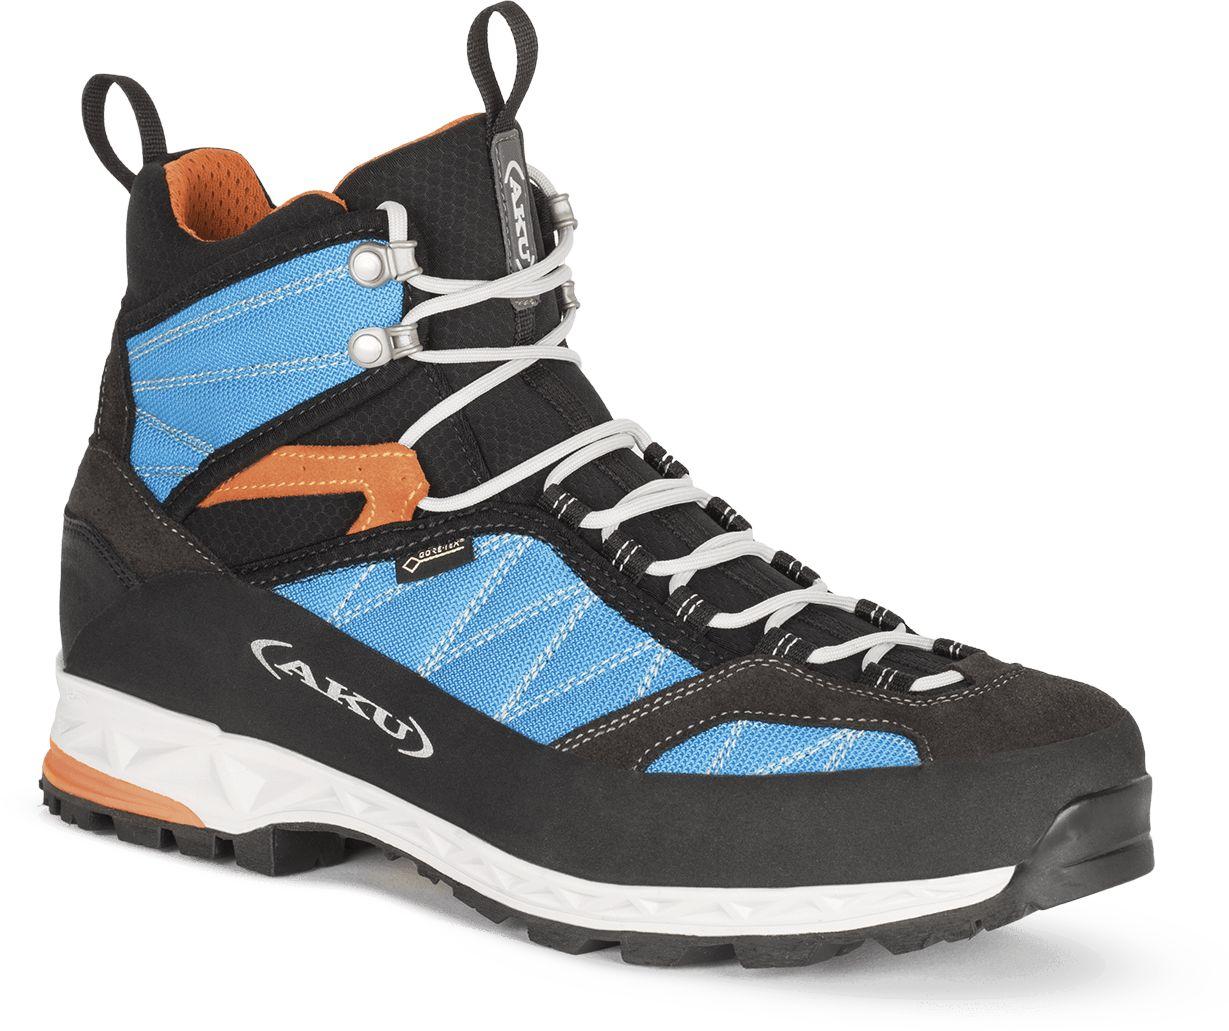 Aku Buty meskie Tengu Lite GTX turquoise/ orange r. 41 975-454-7 Tūrisma apavi